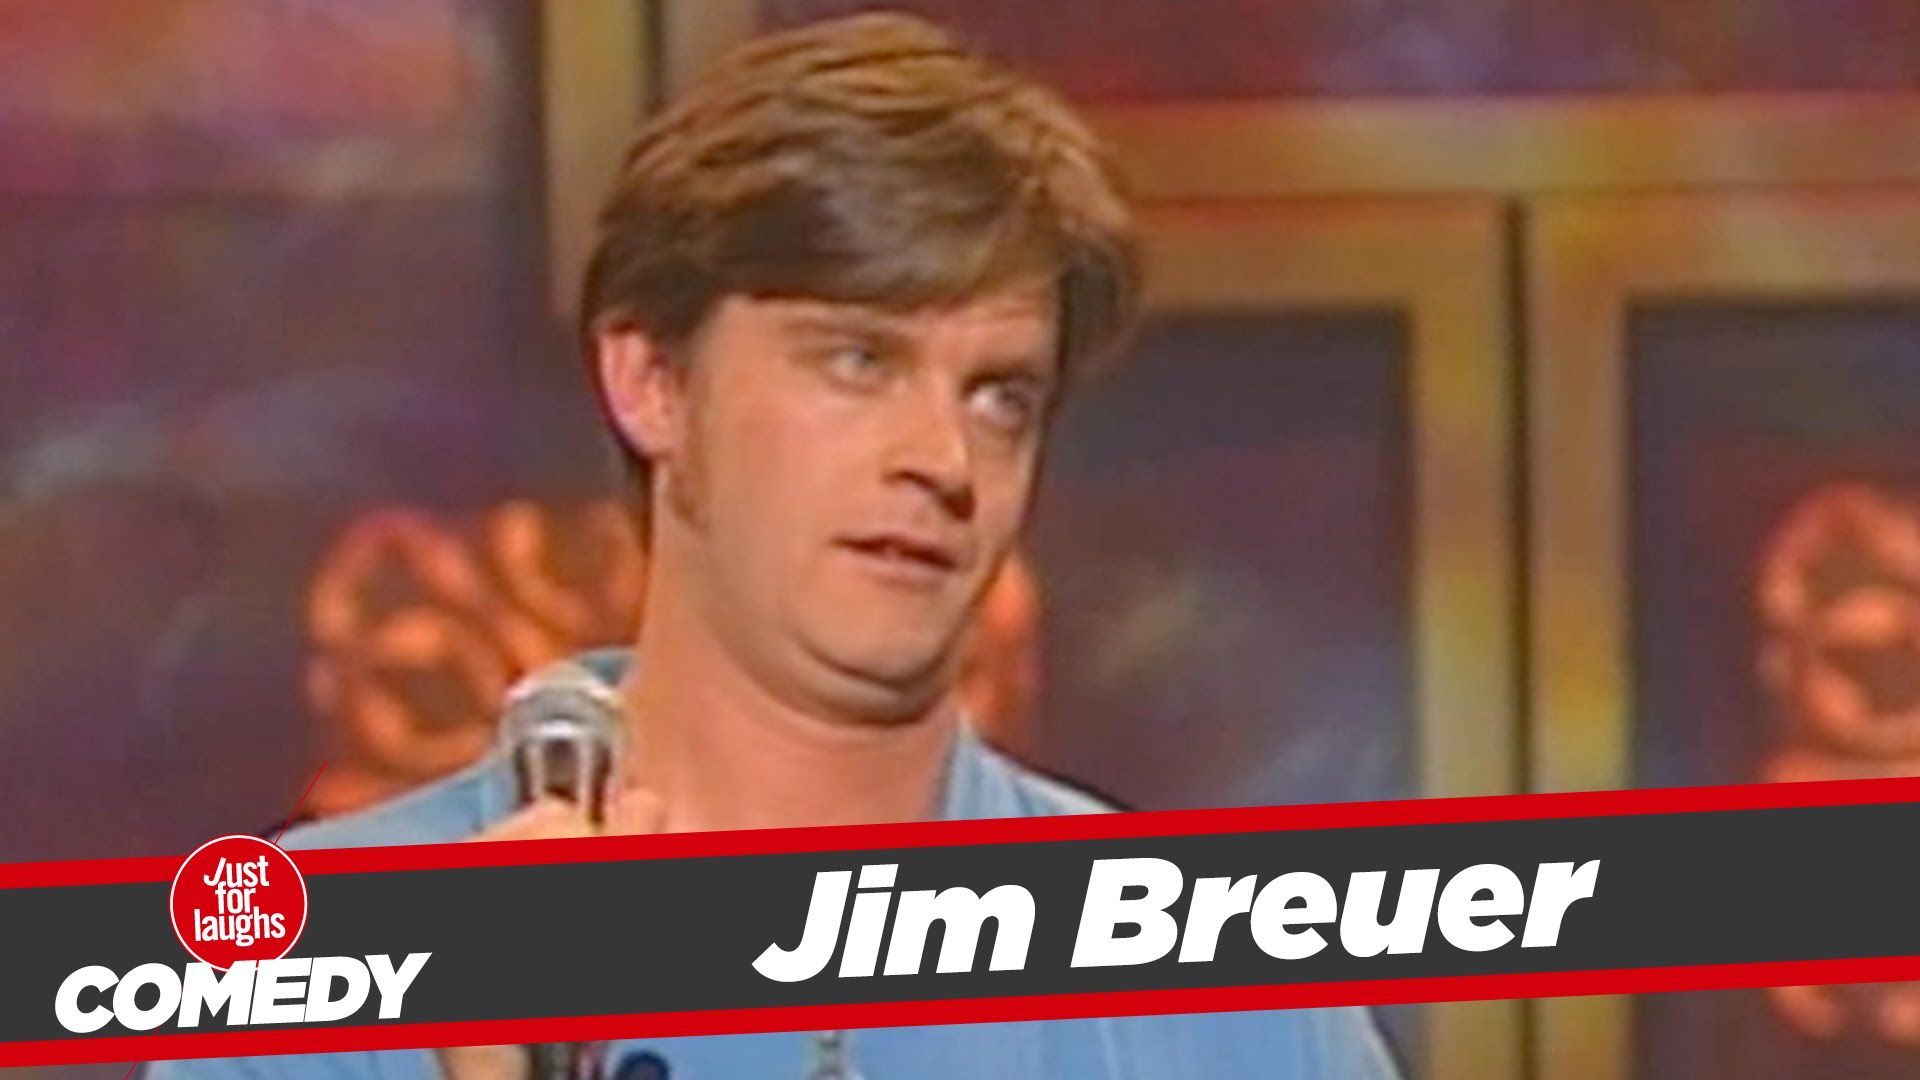 Jim breuer alcohol